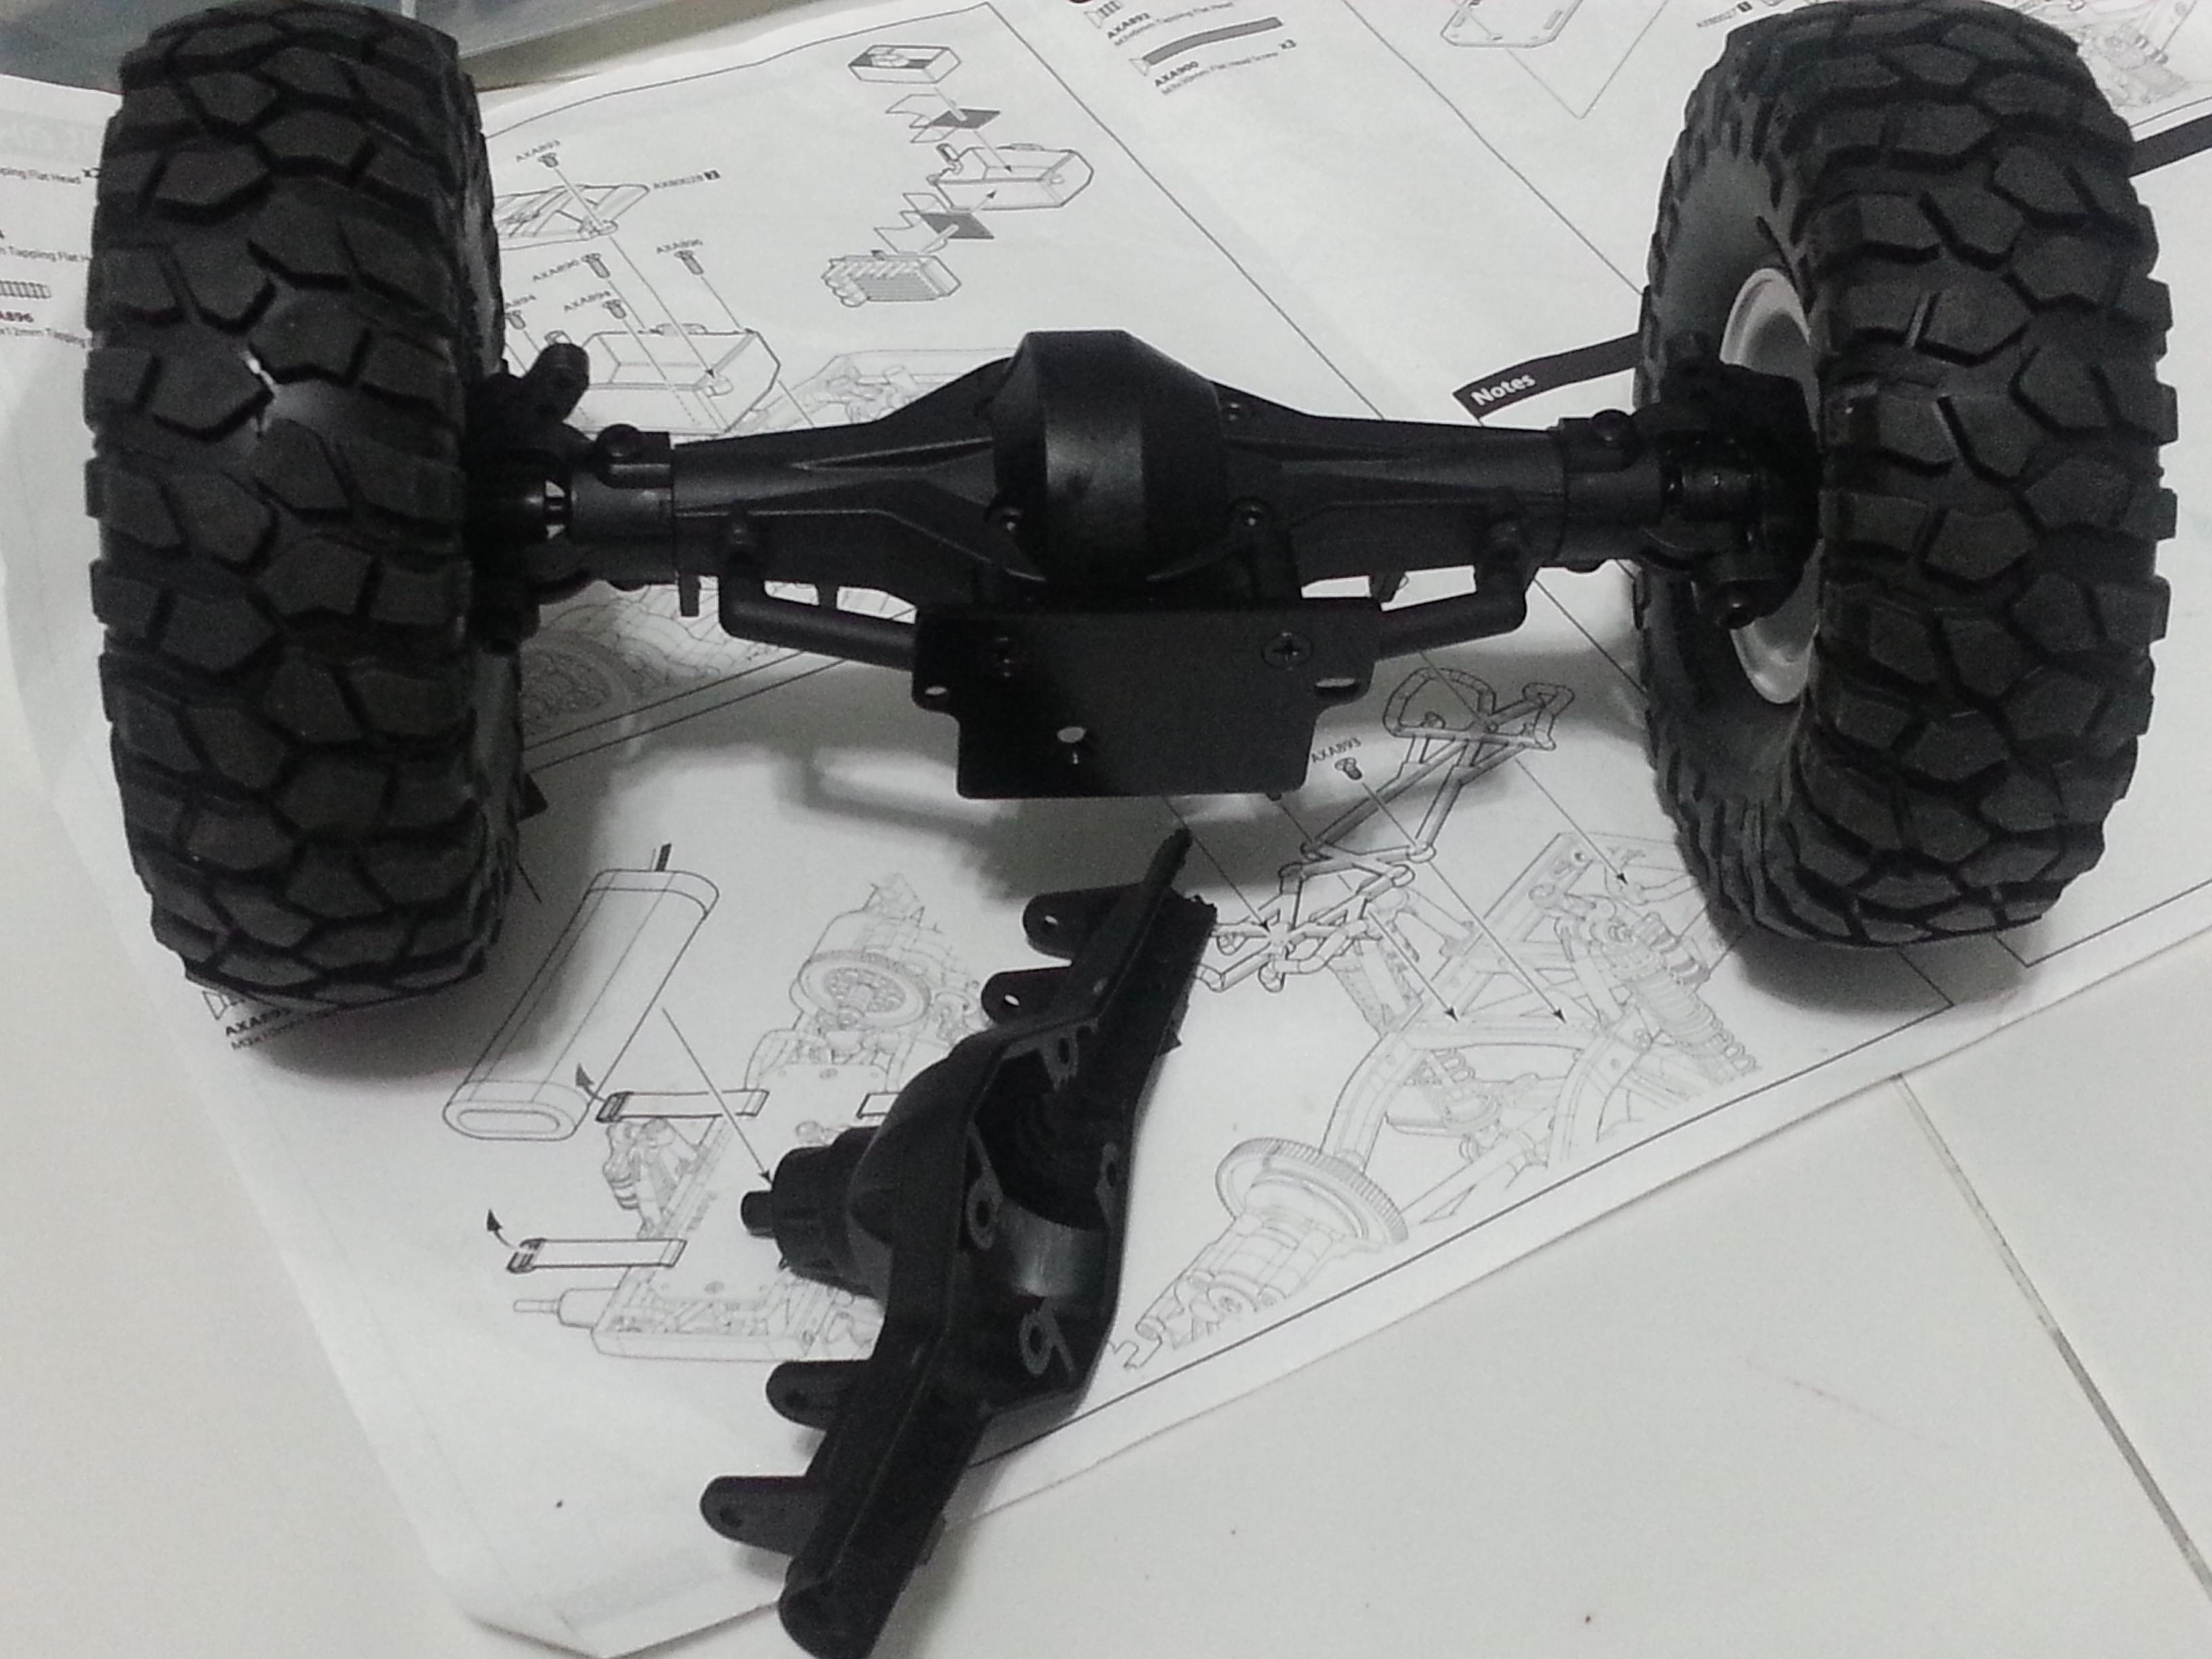 build - Babyboy's first 6x6 build 15774299115_faeb2b37e9_o